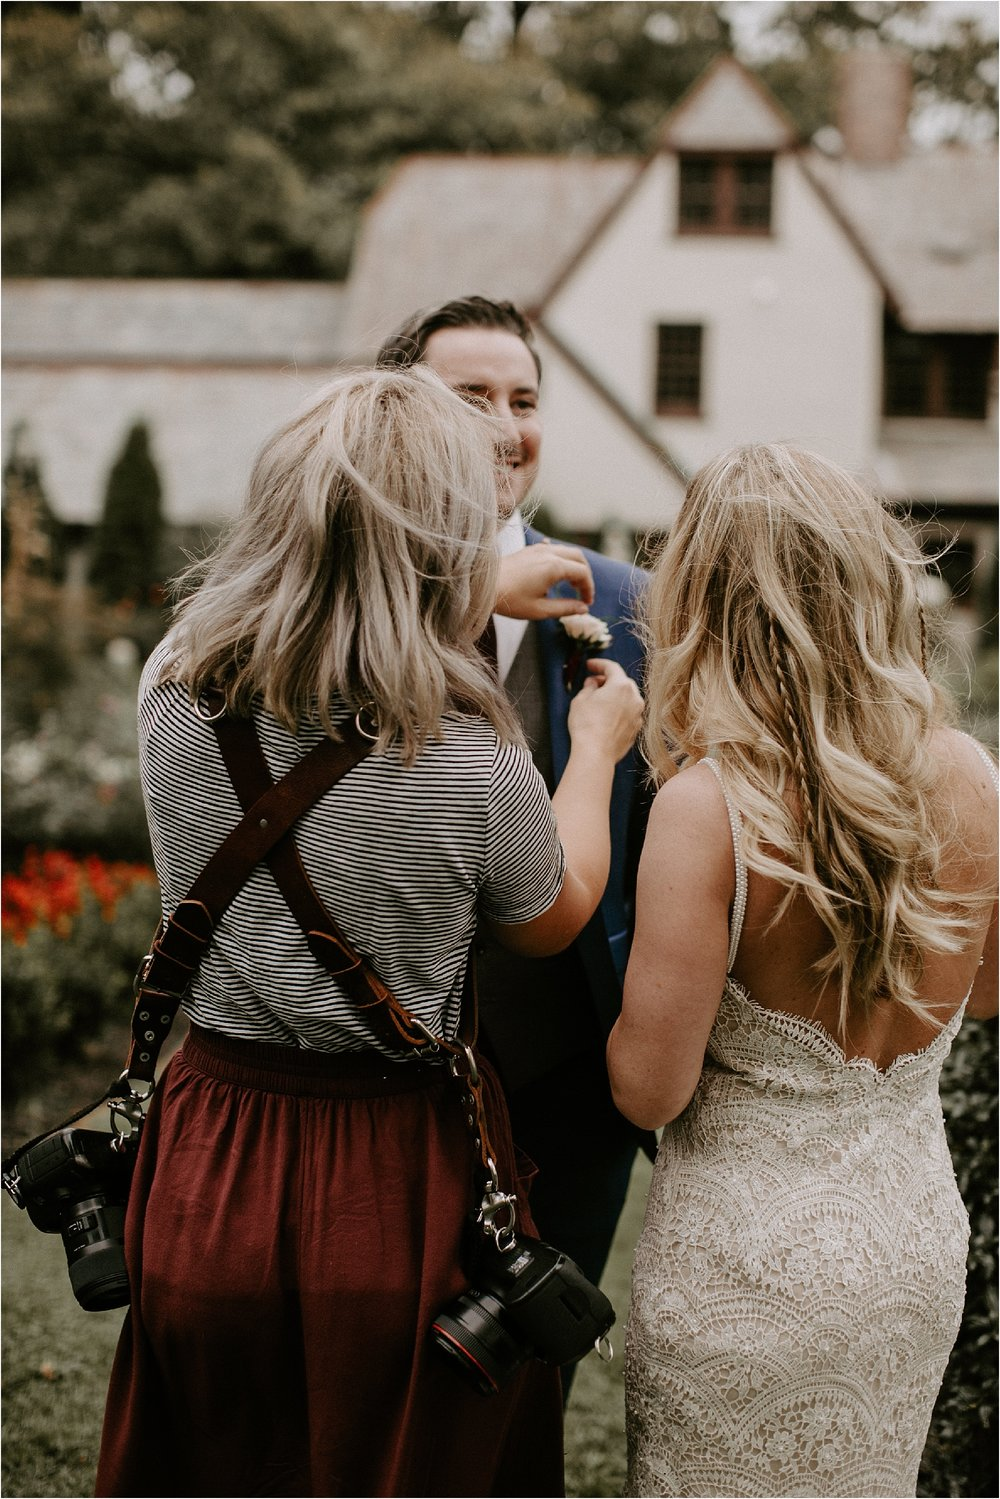 Sarah_Brookhart_PA_MD_Wedding_Photographer_0012.jpg